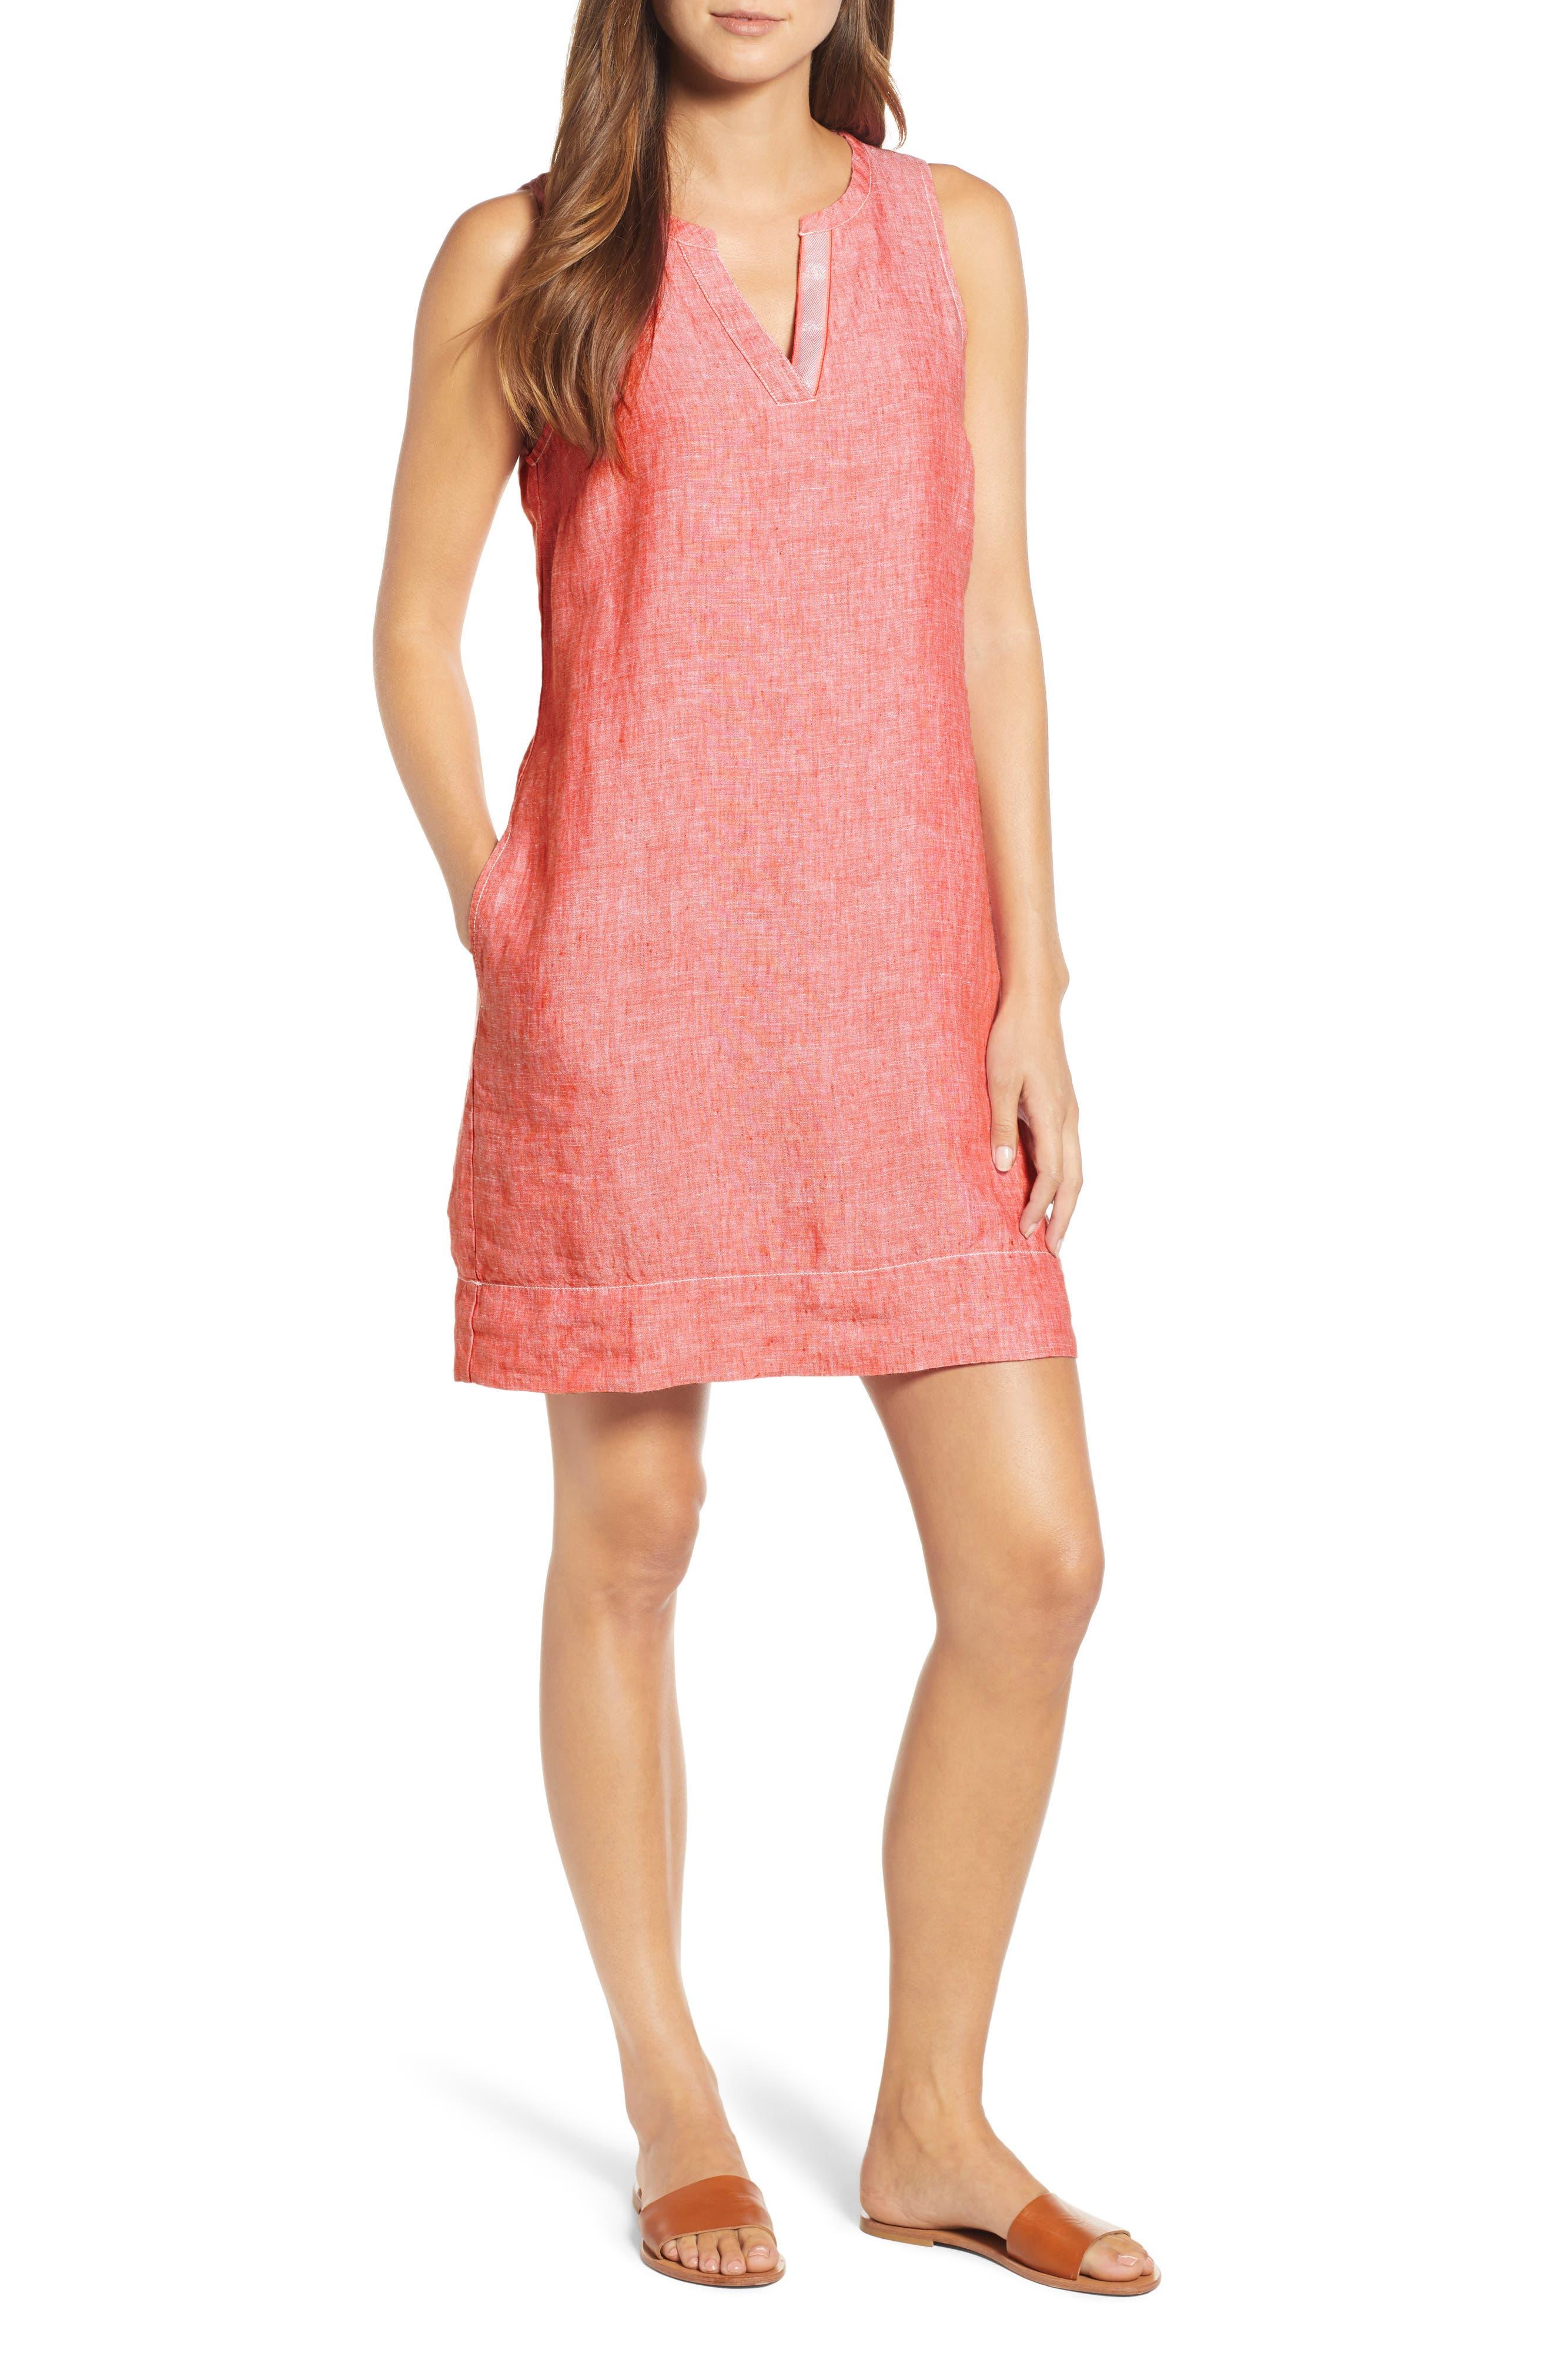 827860c828 Women s Linen Dresses